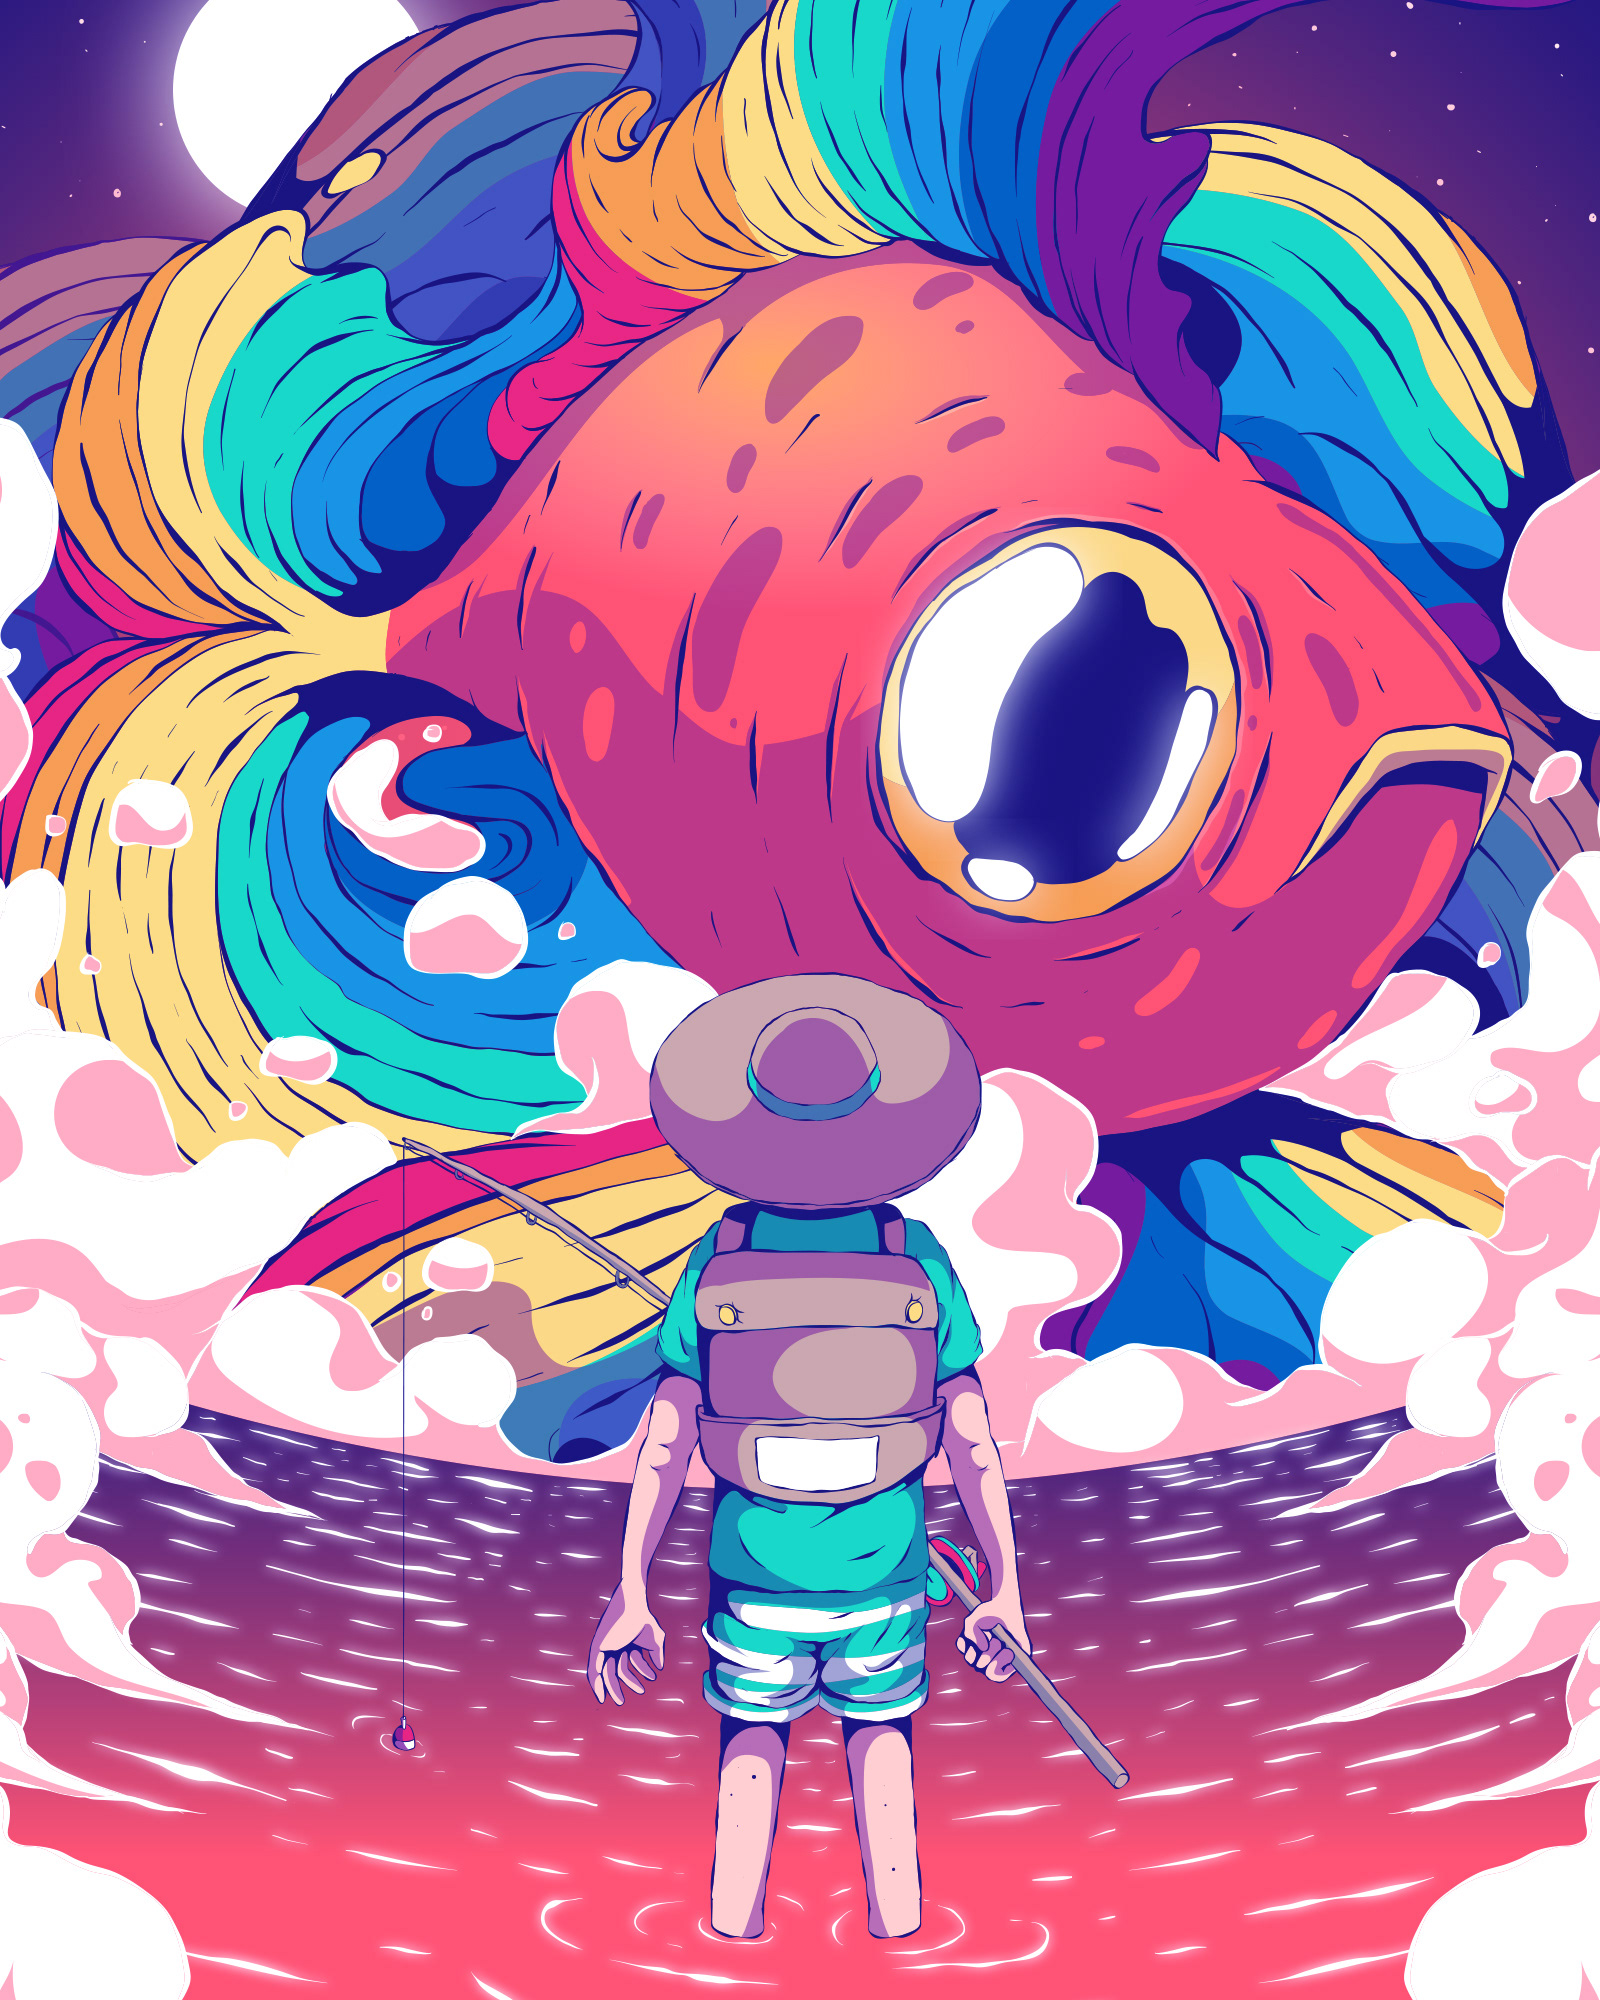 Colorful Pop Illustrations By Fernando Nunes